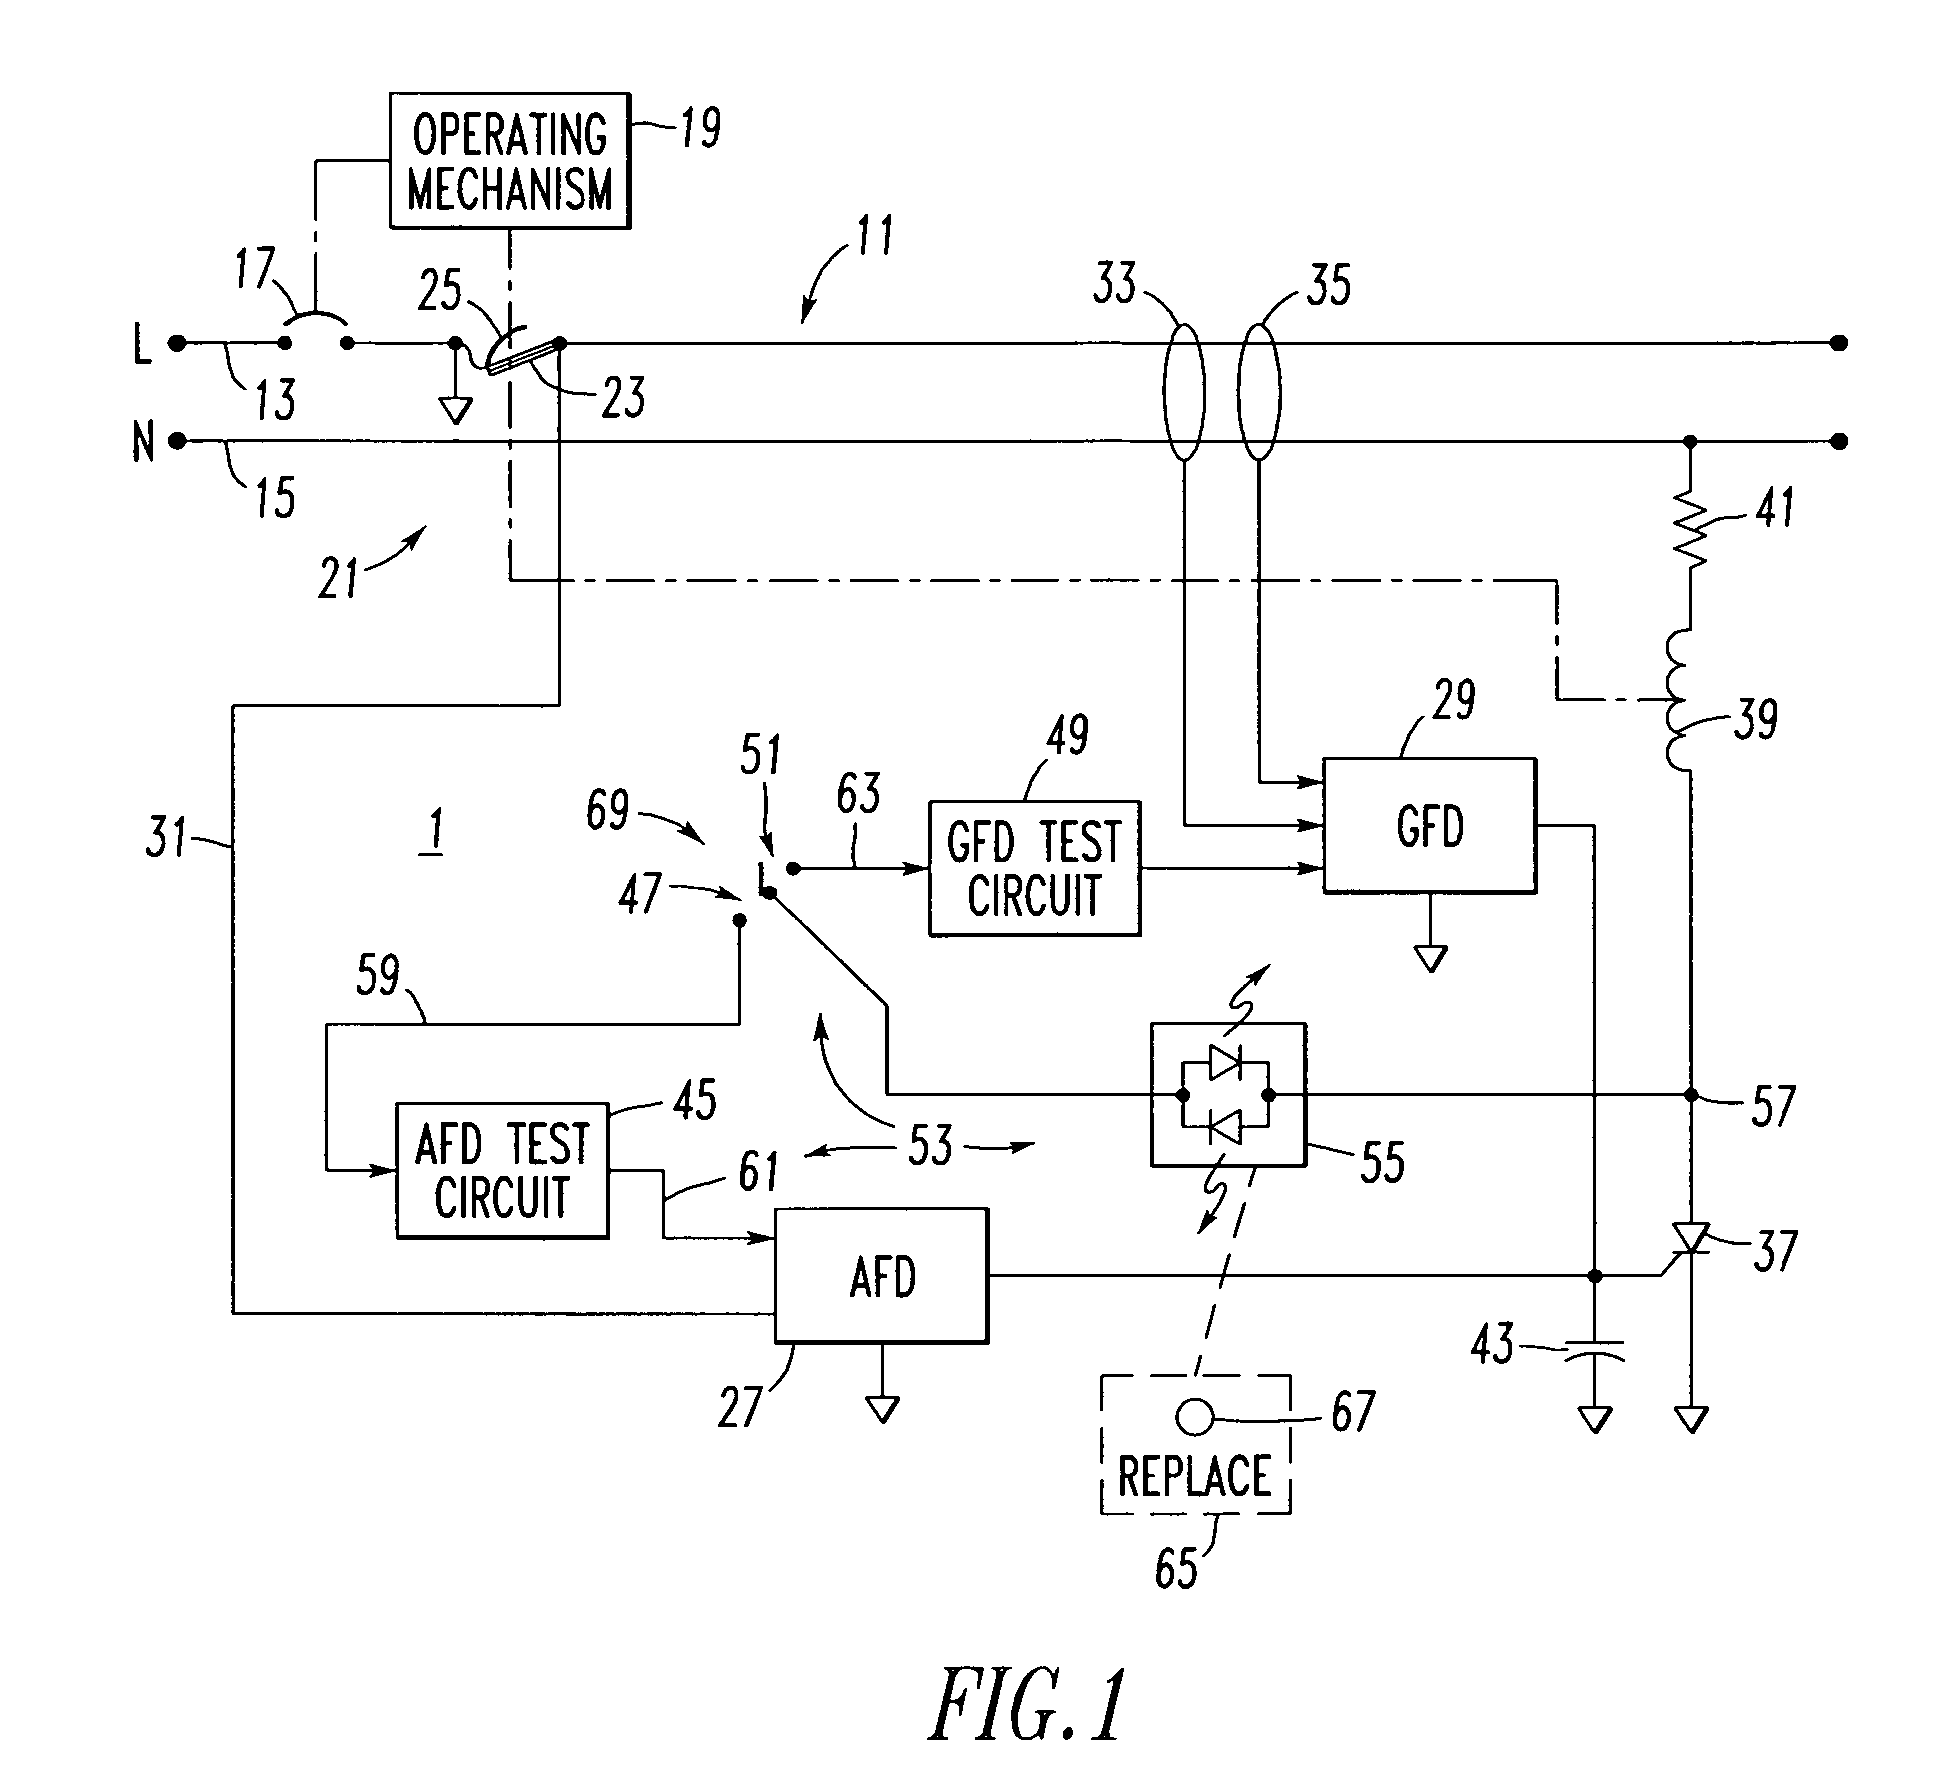 Wv 3682  Patent Us8599523 Arc Fault Circuit Interrupter